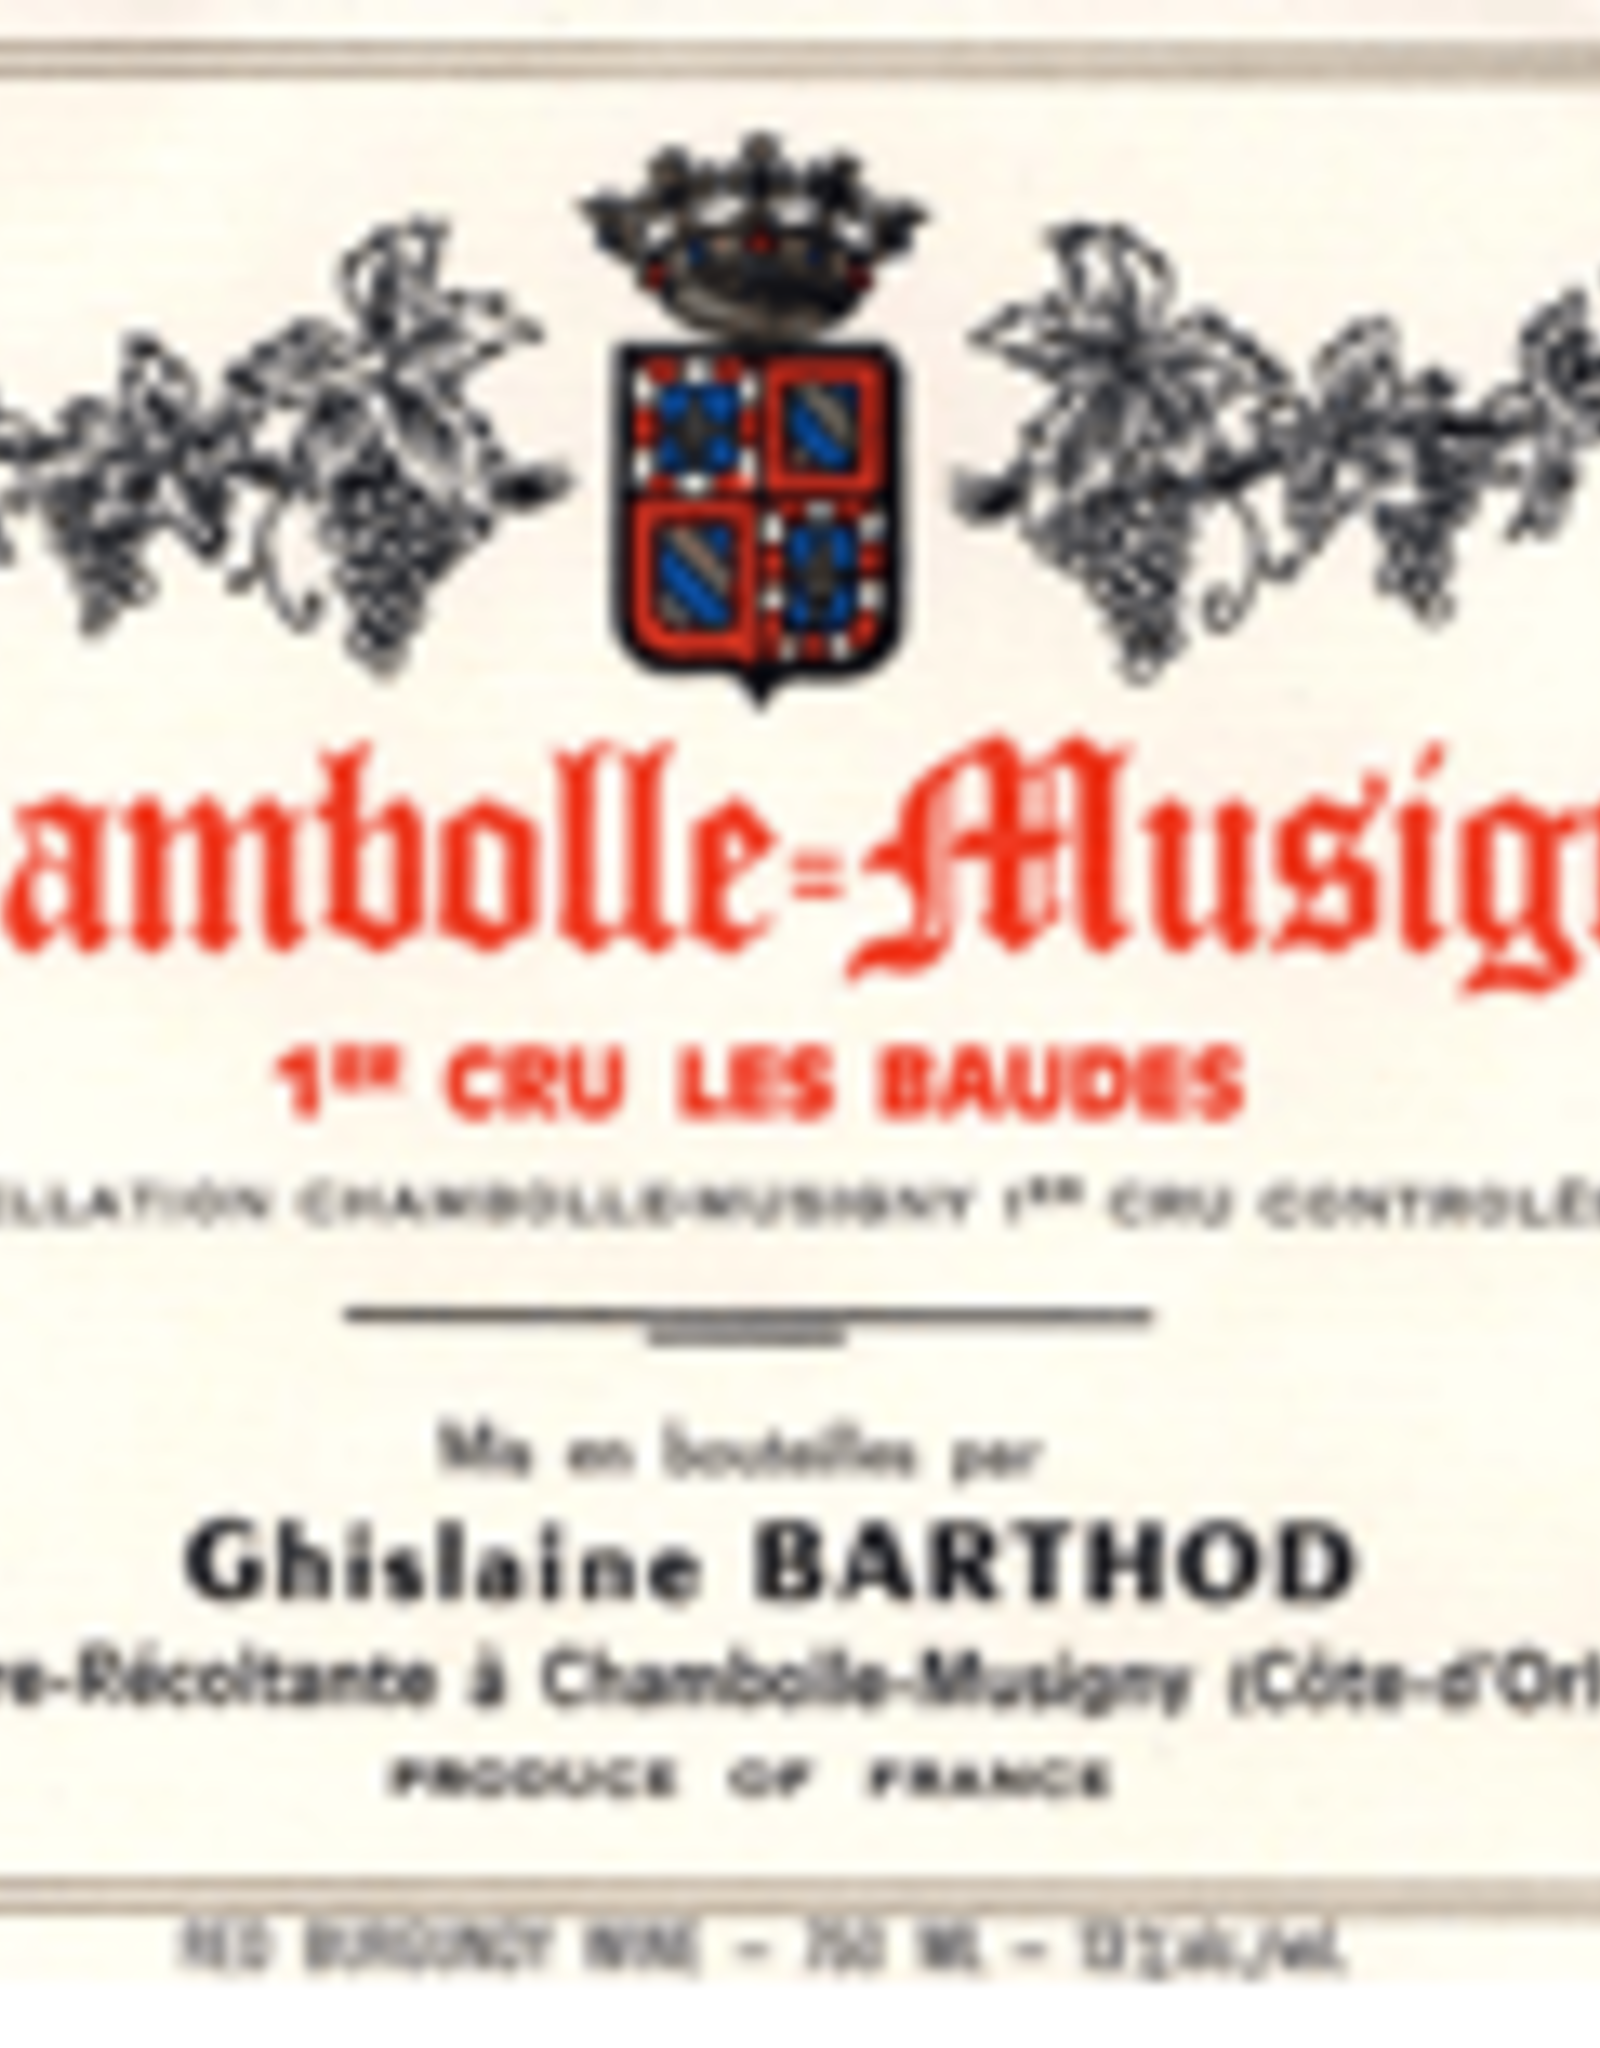 R Burgundy, Chambolle Musigny 1er, LES BAUDES, Barthod 2017